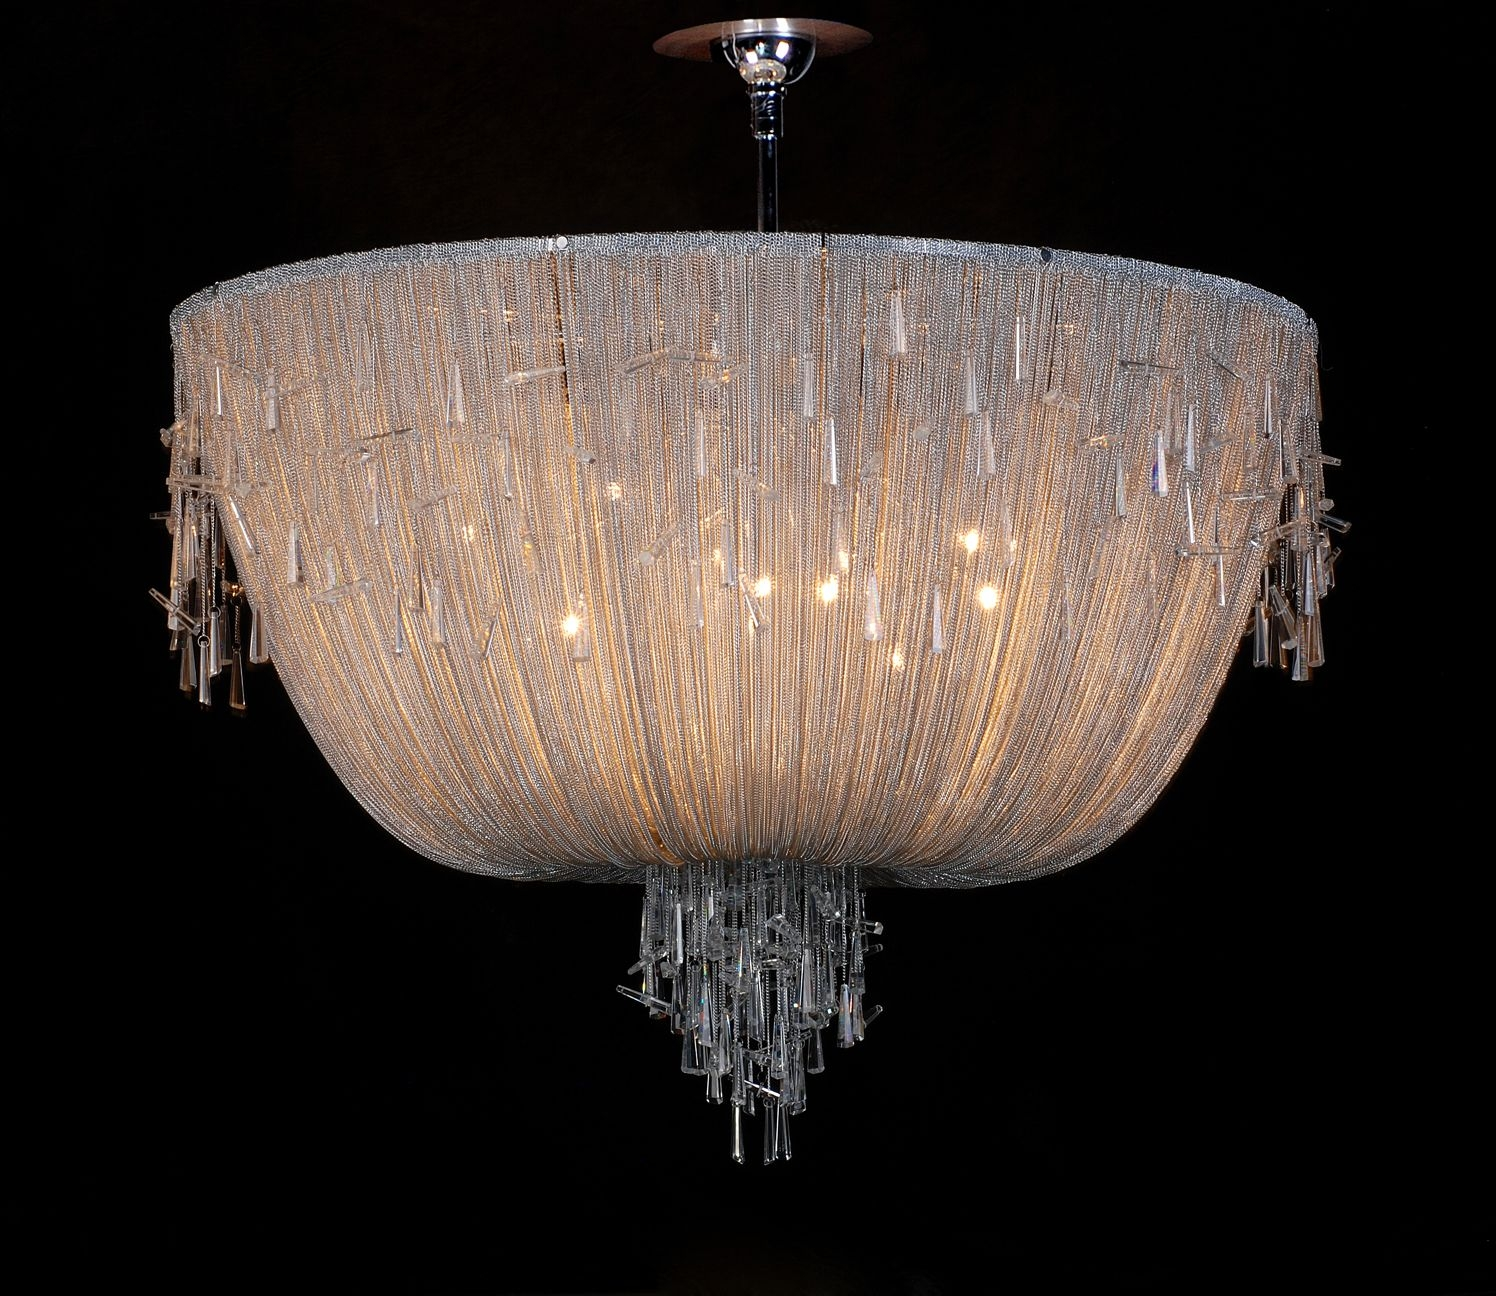 Home Bespoke Italian Chandeliers Hand Blown Glass Lighting Within Italian Chandelier Style (Image 8 of 15)